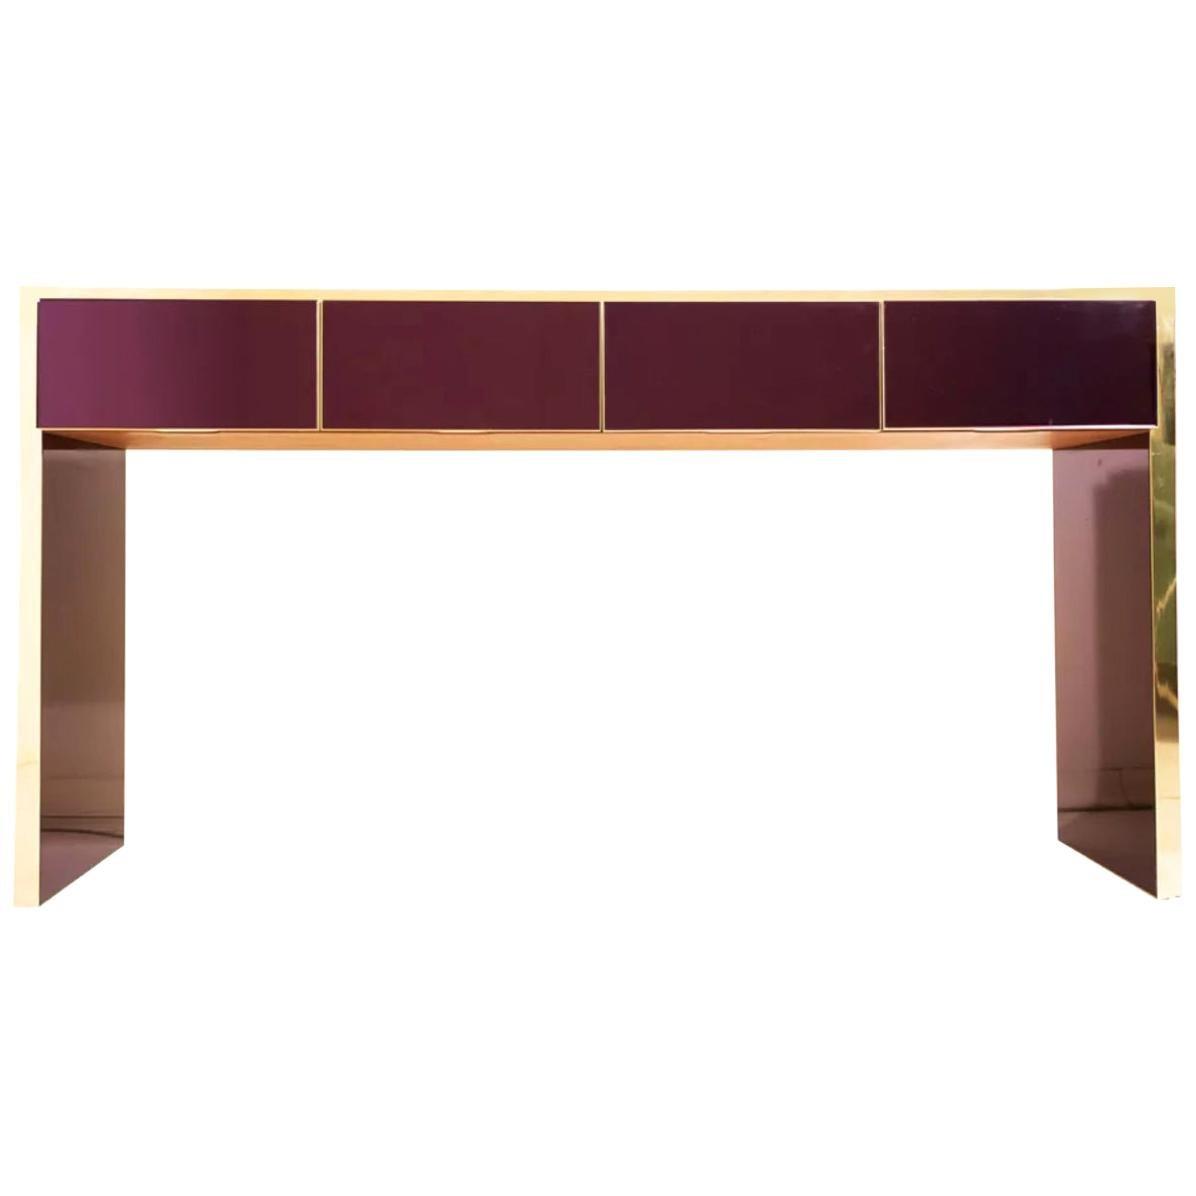 Bespoke Italian Design 4 Drawers Burgundy & Brass Center Console Table/Sideboard